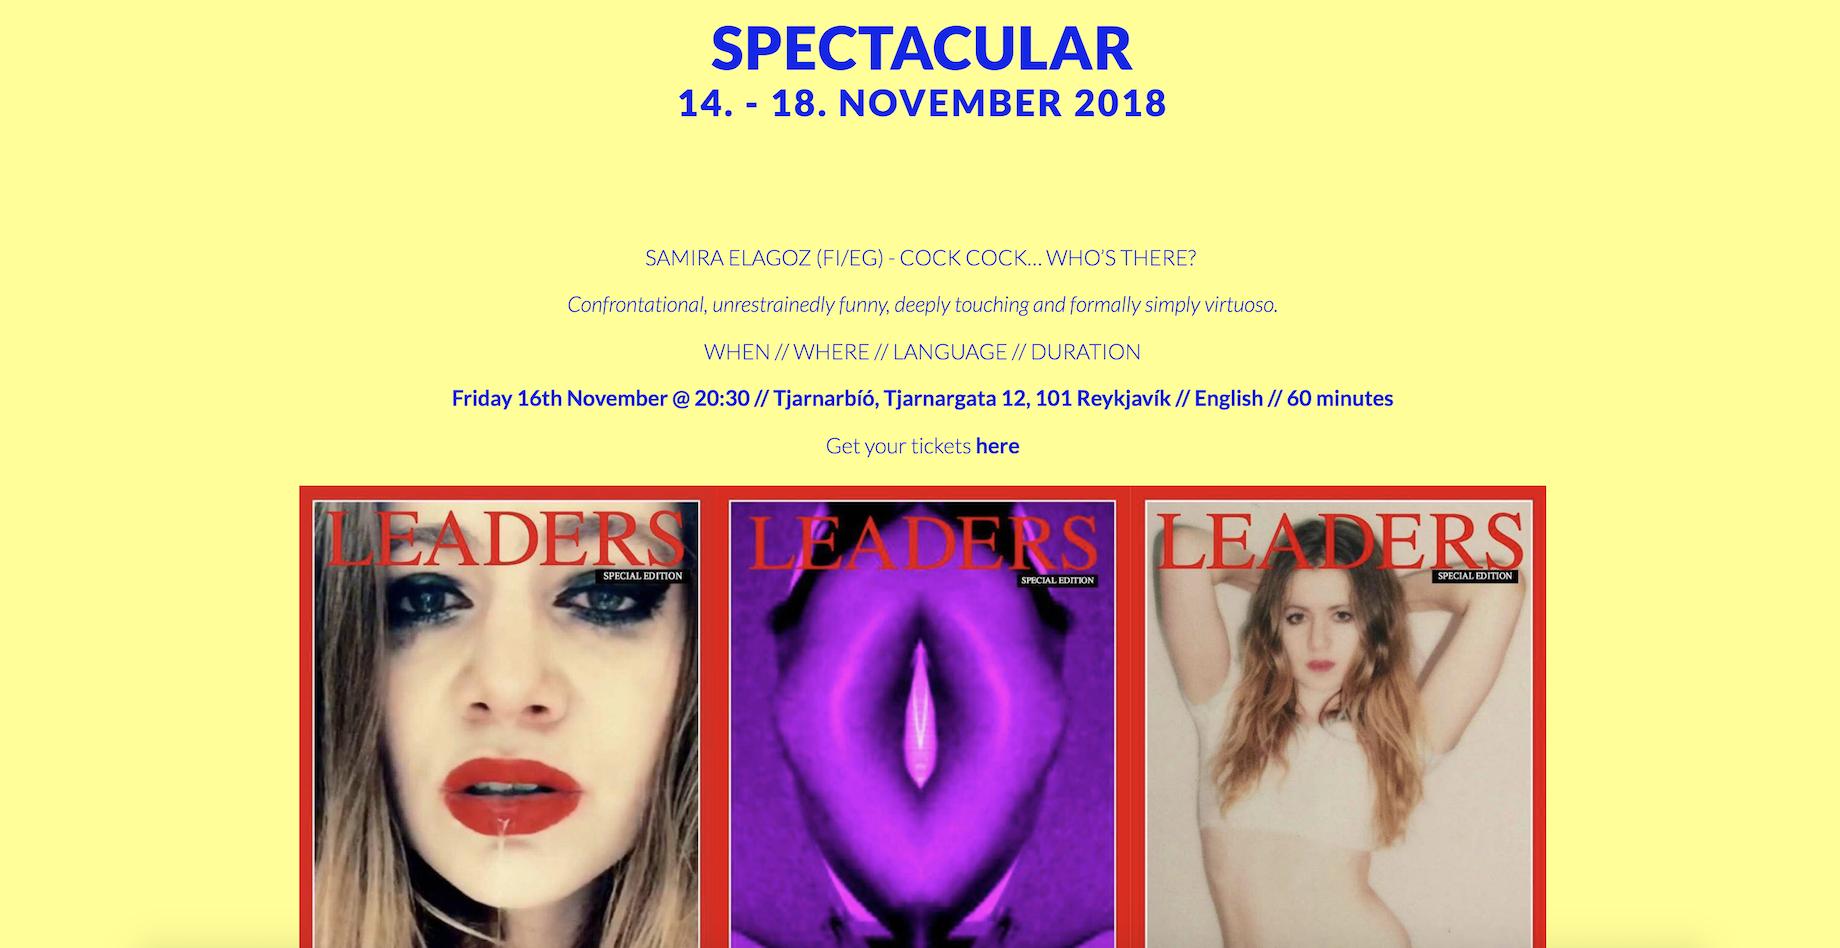 COCK COCK @ SPECTACULAR FESTIVAL, REYKJAVIK, 16th OF NOVEMBER